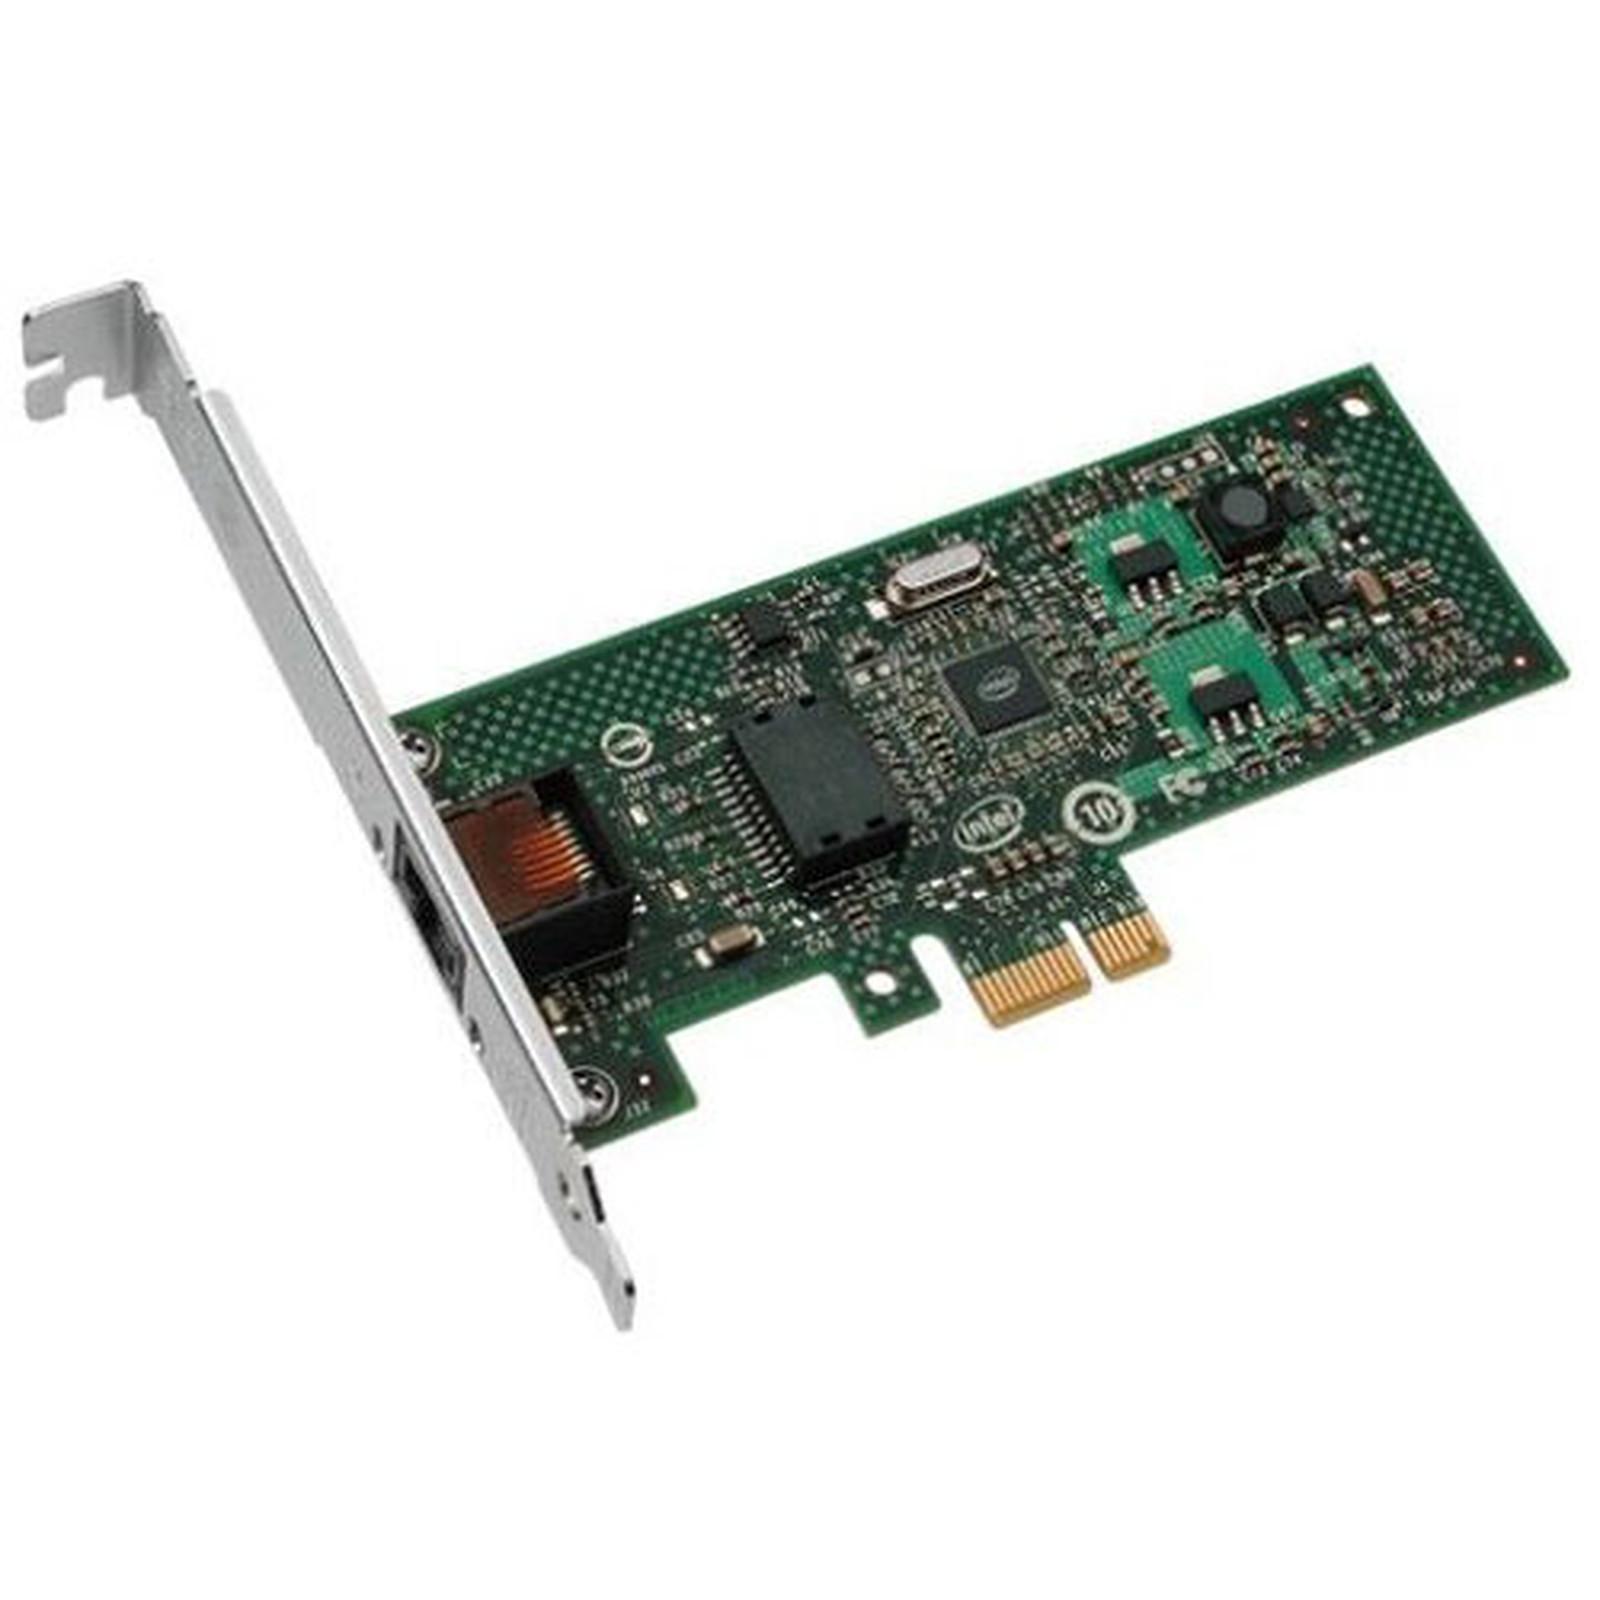 Intel PRO/1000 CT Desktop Adapter